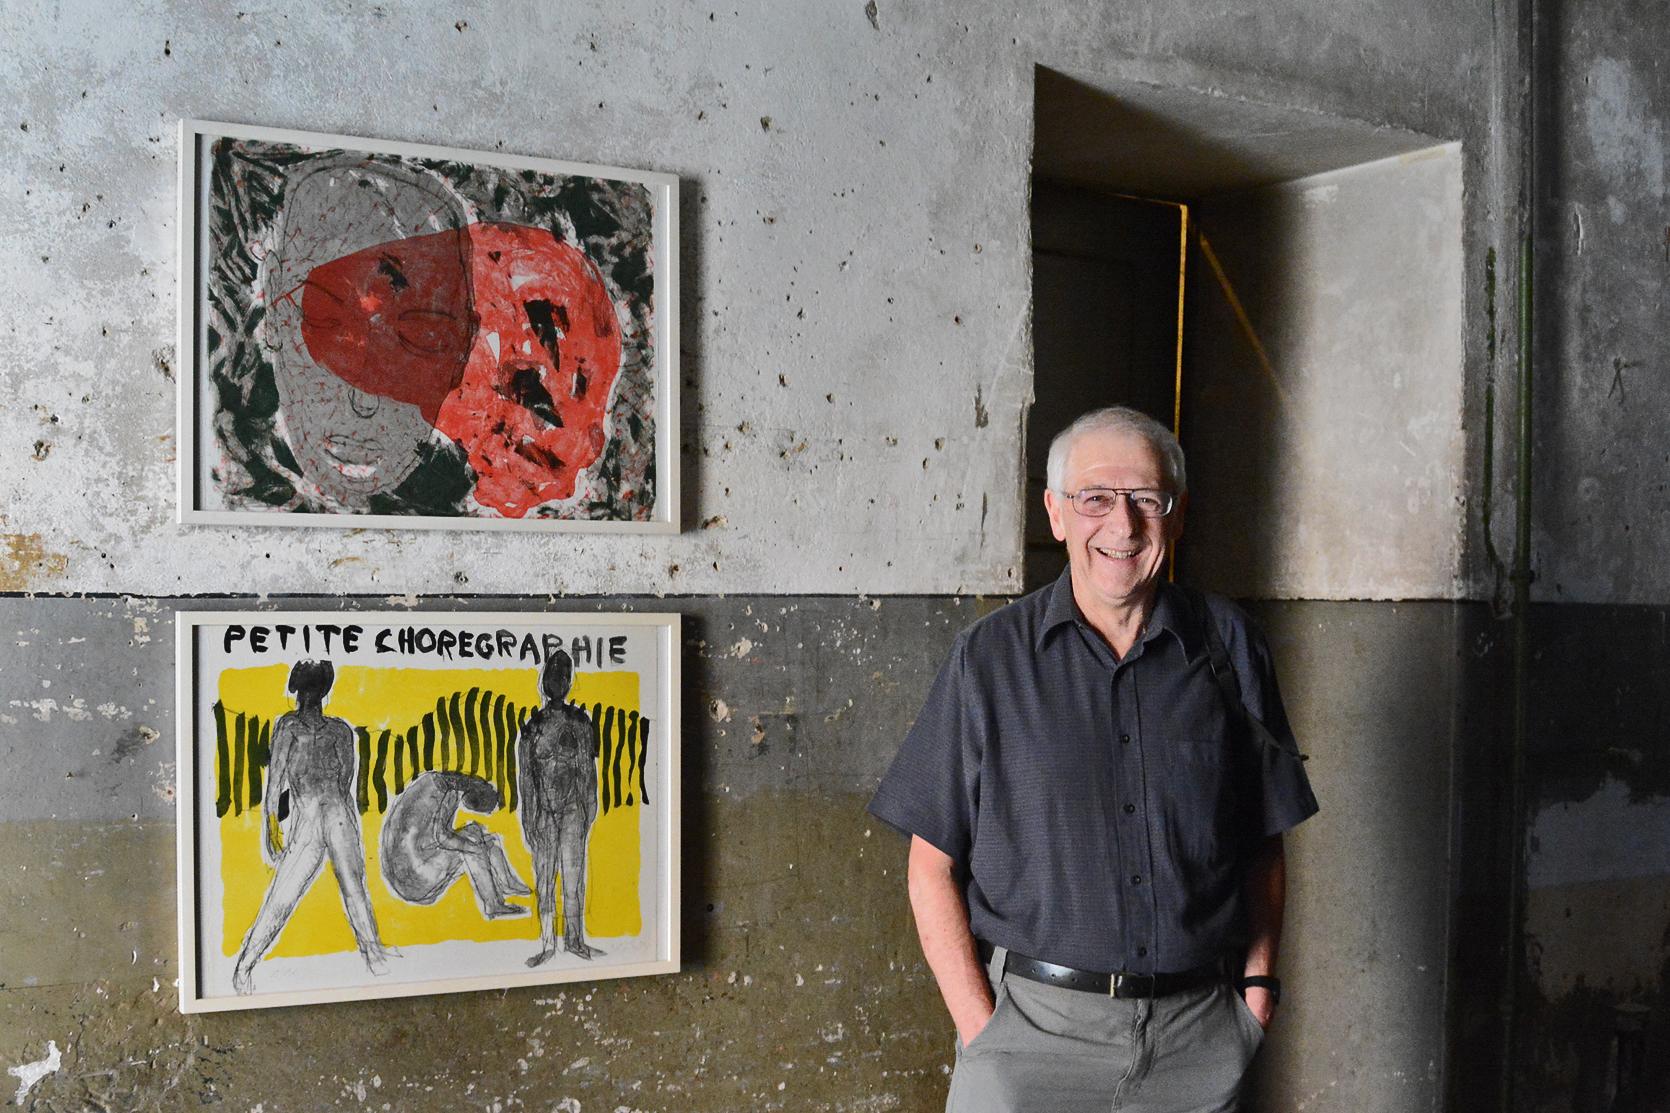 Jean-Denis Zaech